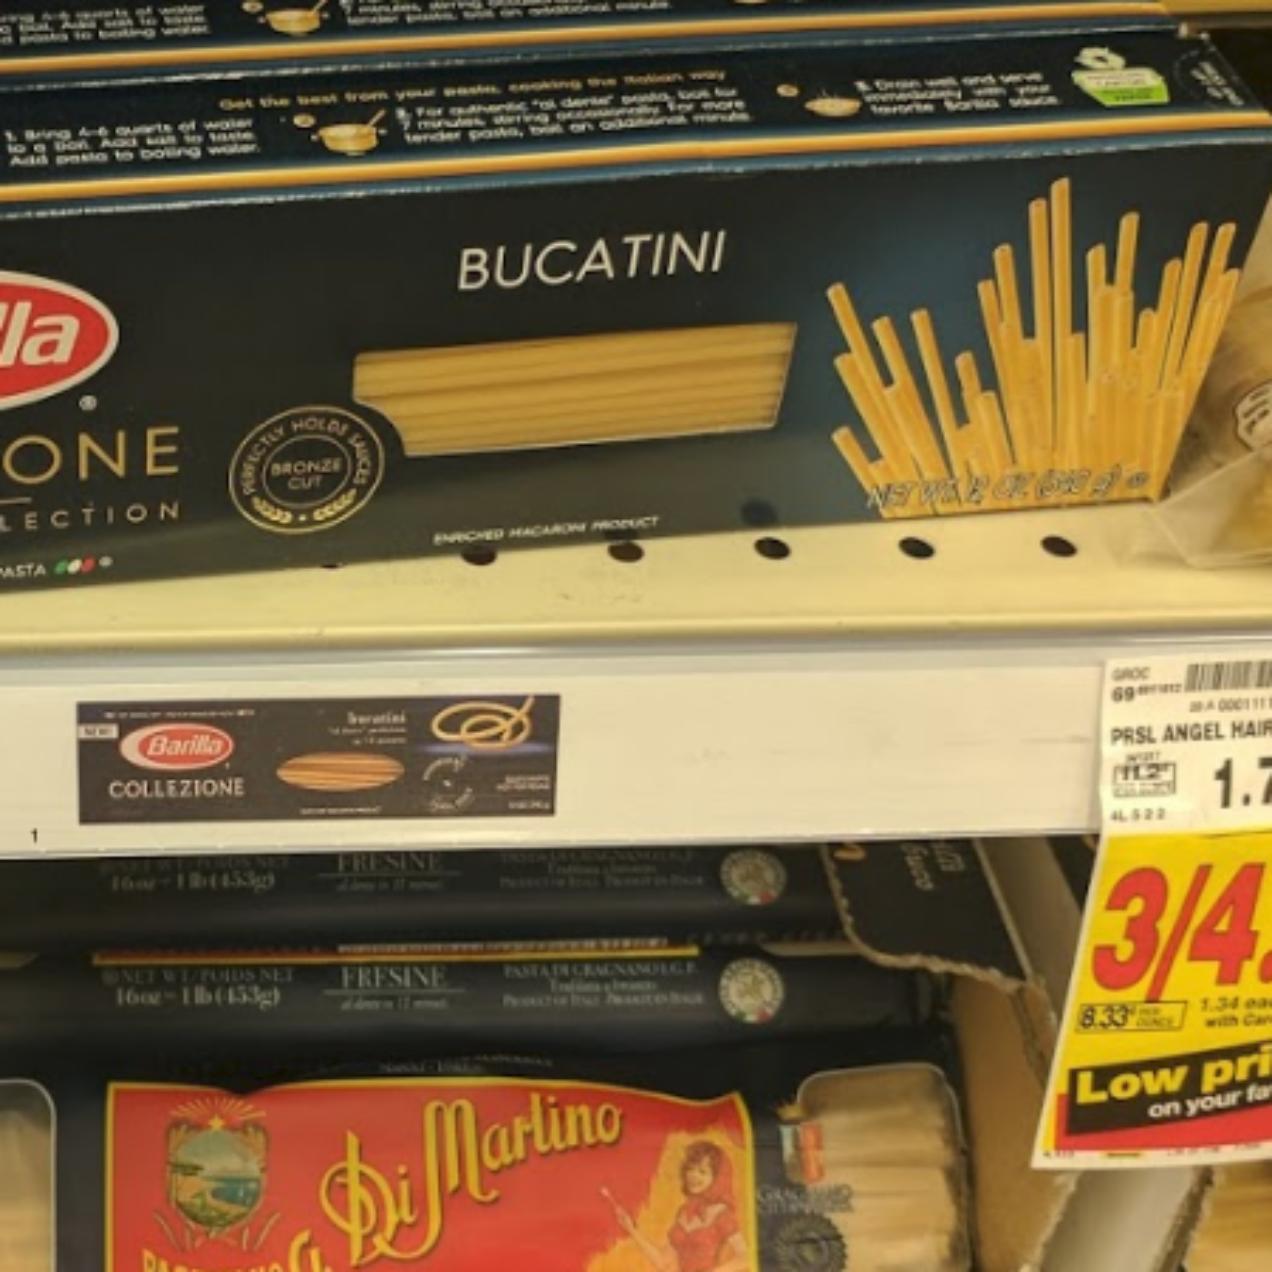 Barilla Collezione Only $0.54 at Kroger Mega Sale (Regular $2.49)